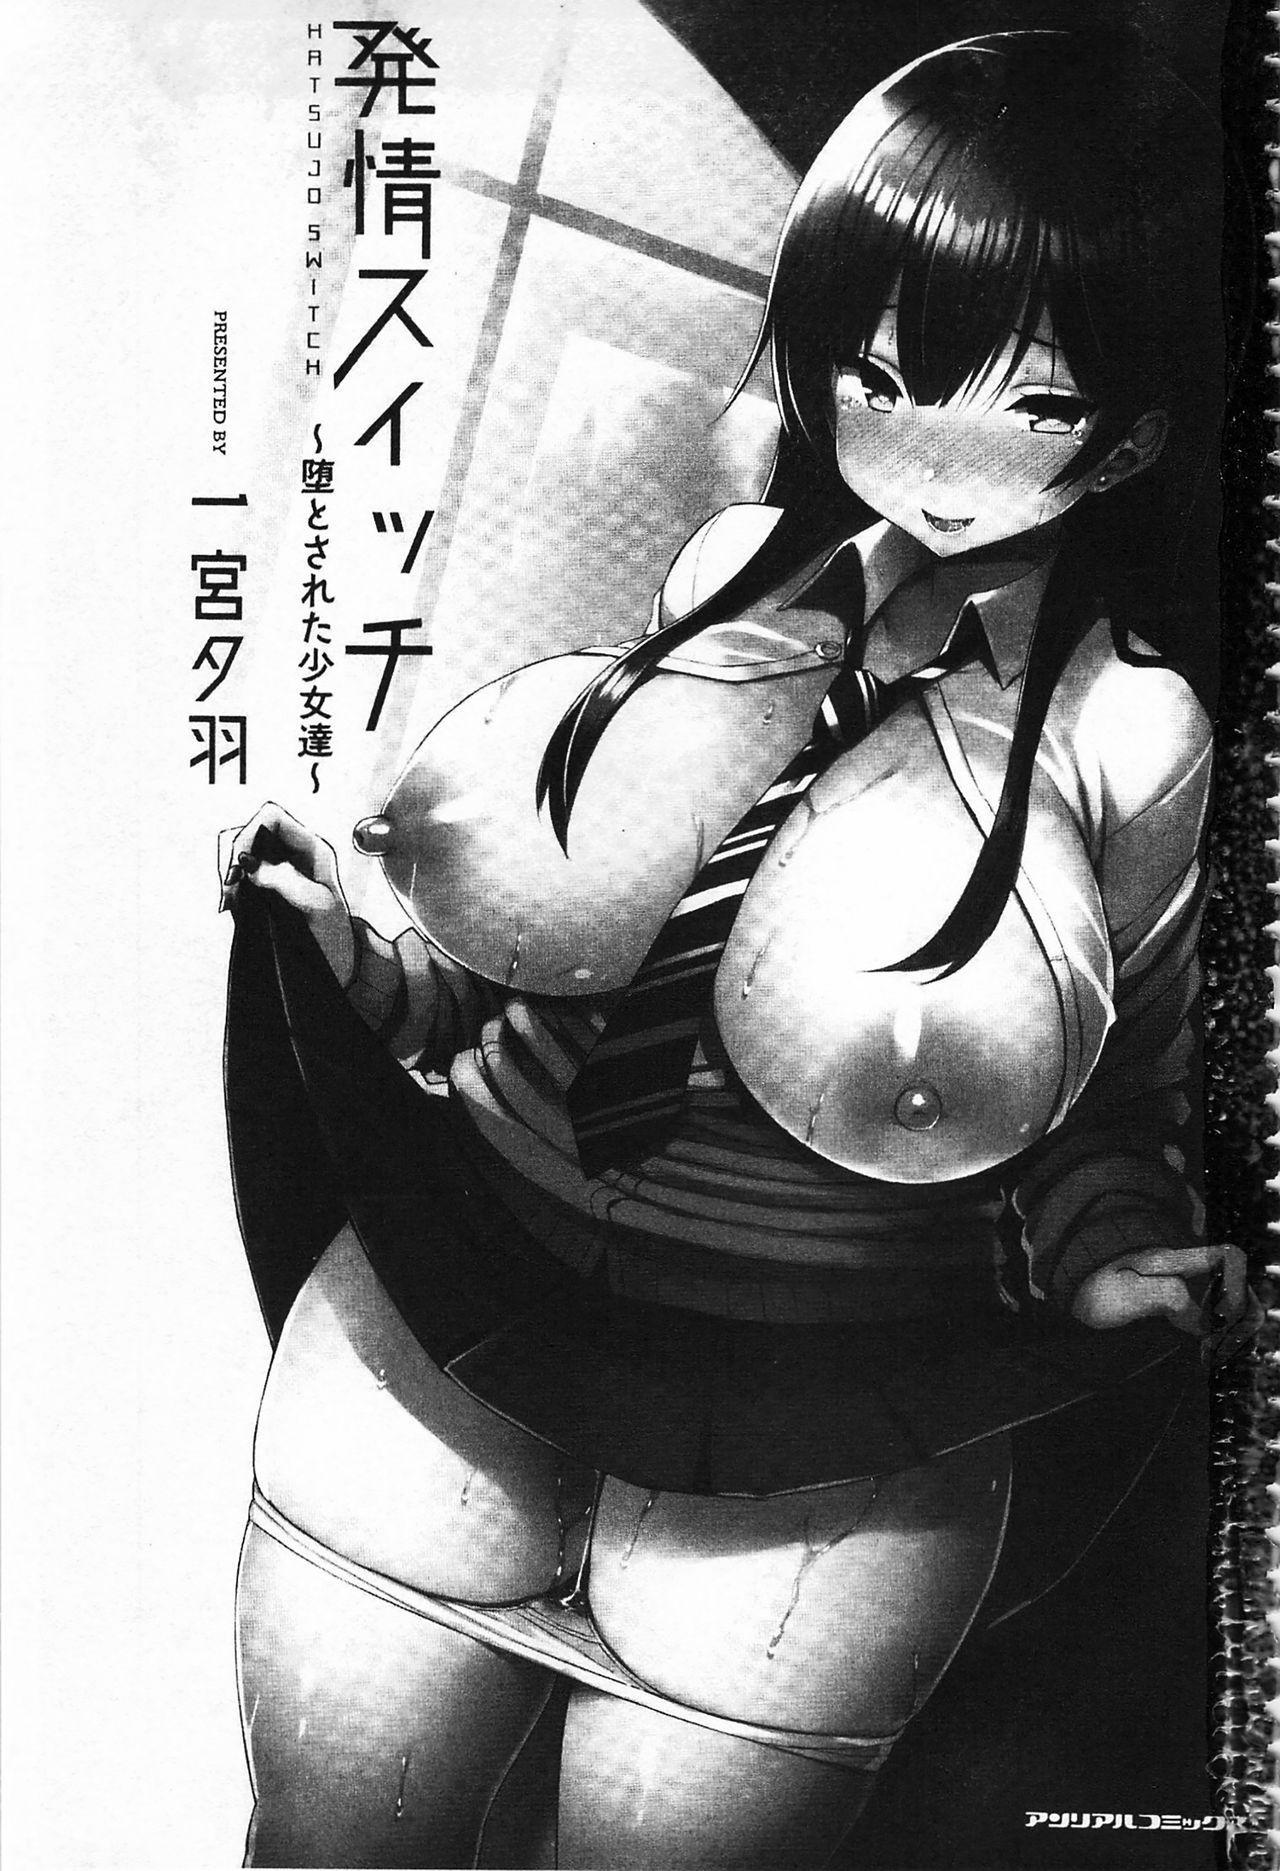 [Ichinomiya Yuu] Hatsujou Switch ~ Otosareta Shoujo-tachi ~   發情啟動開關~墮落下去的少女們~ [Chinese] 4